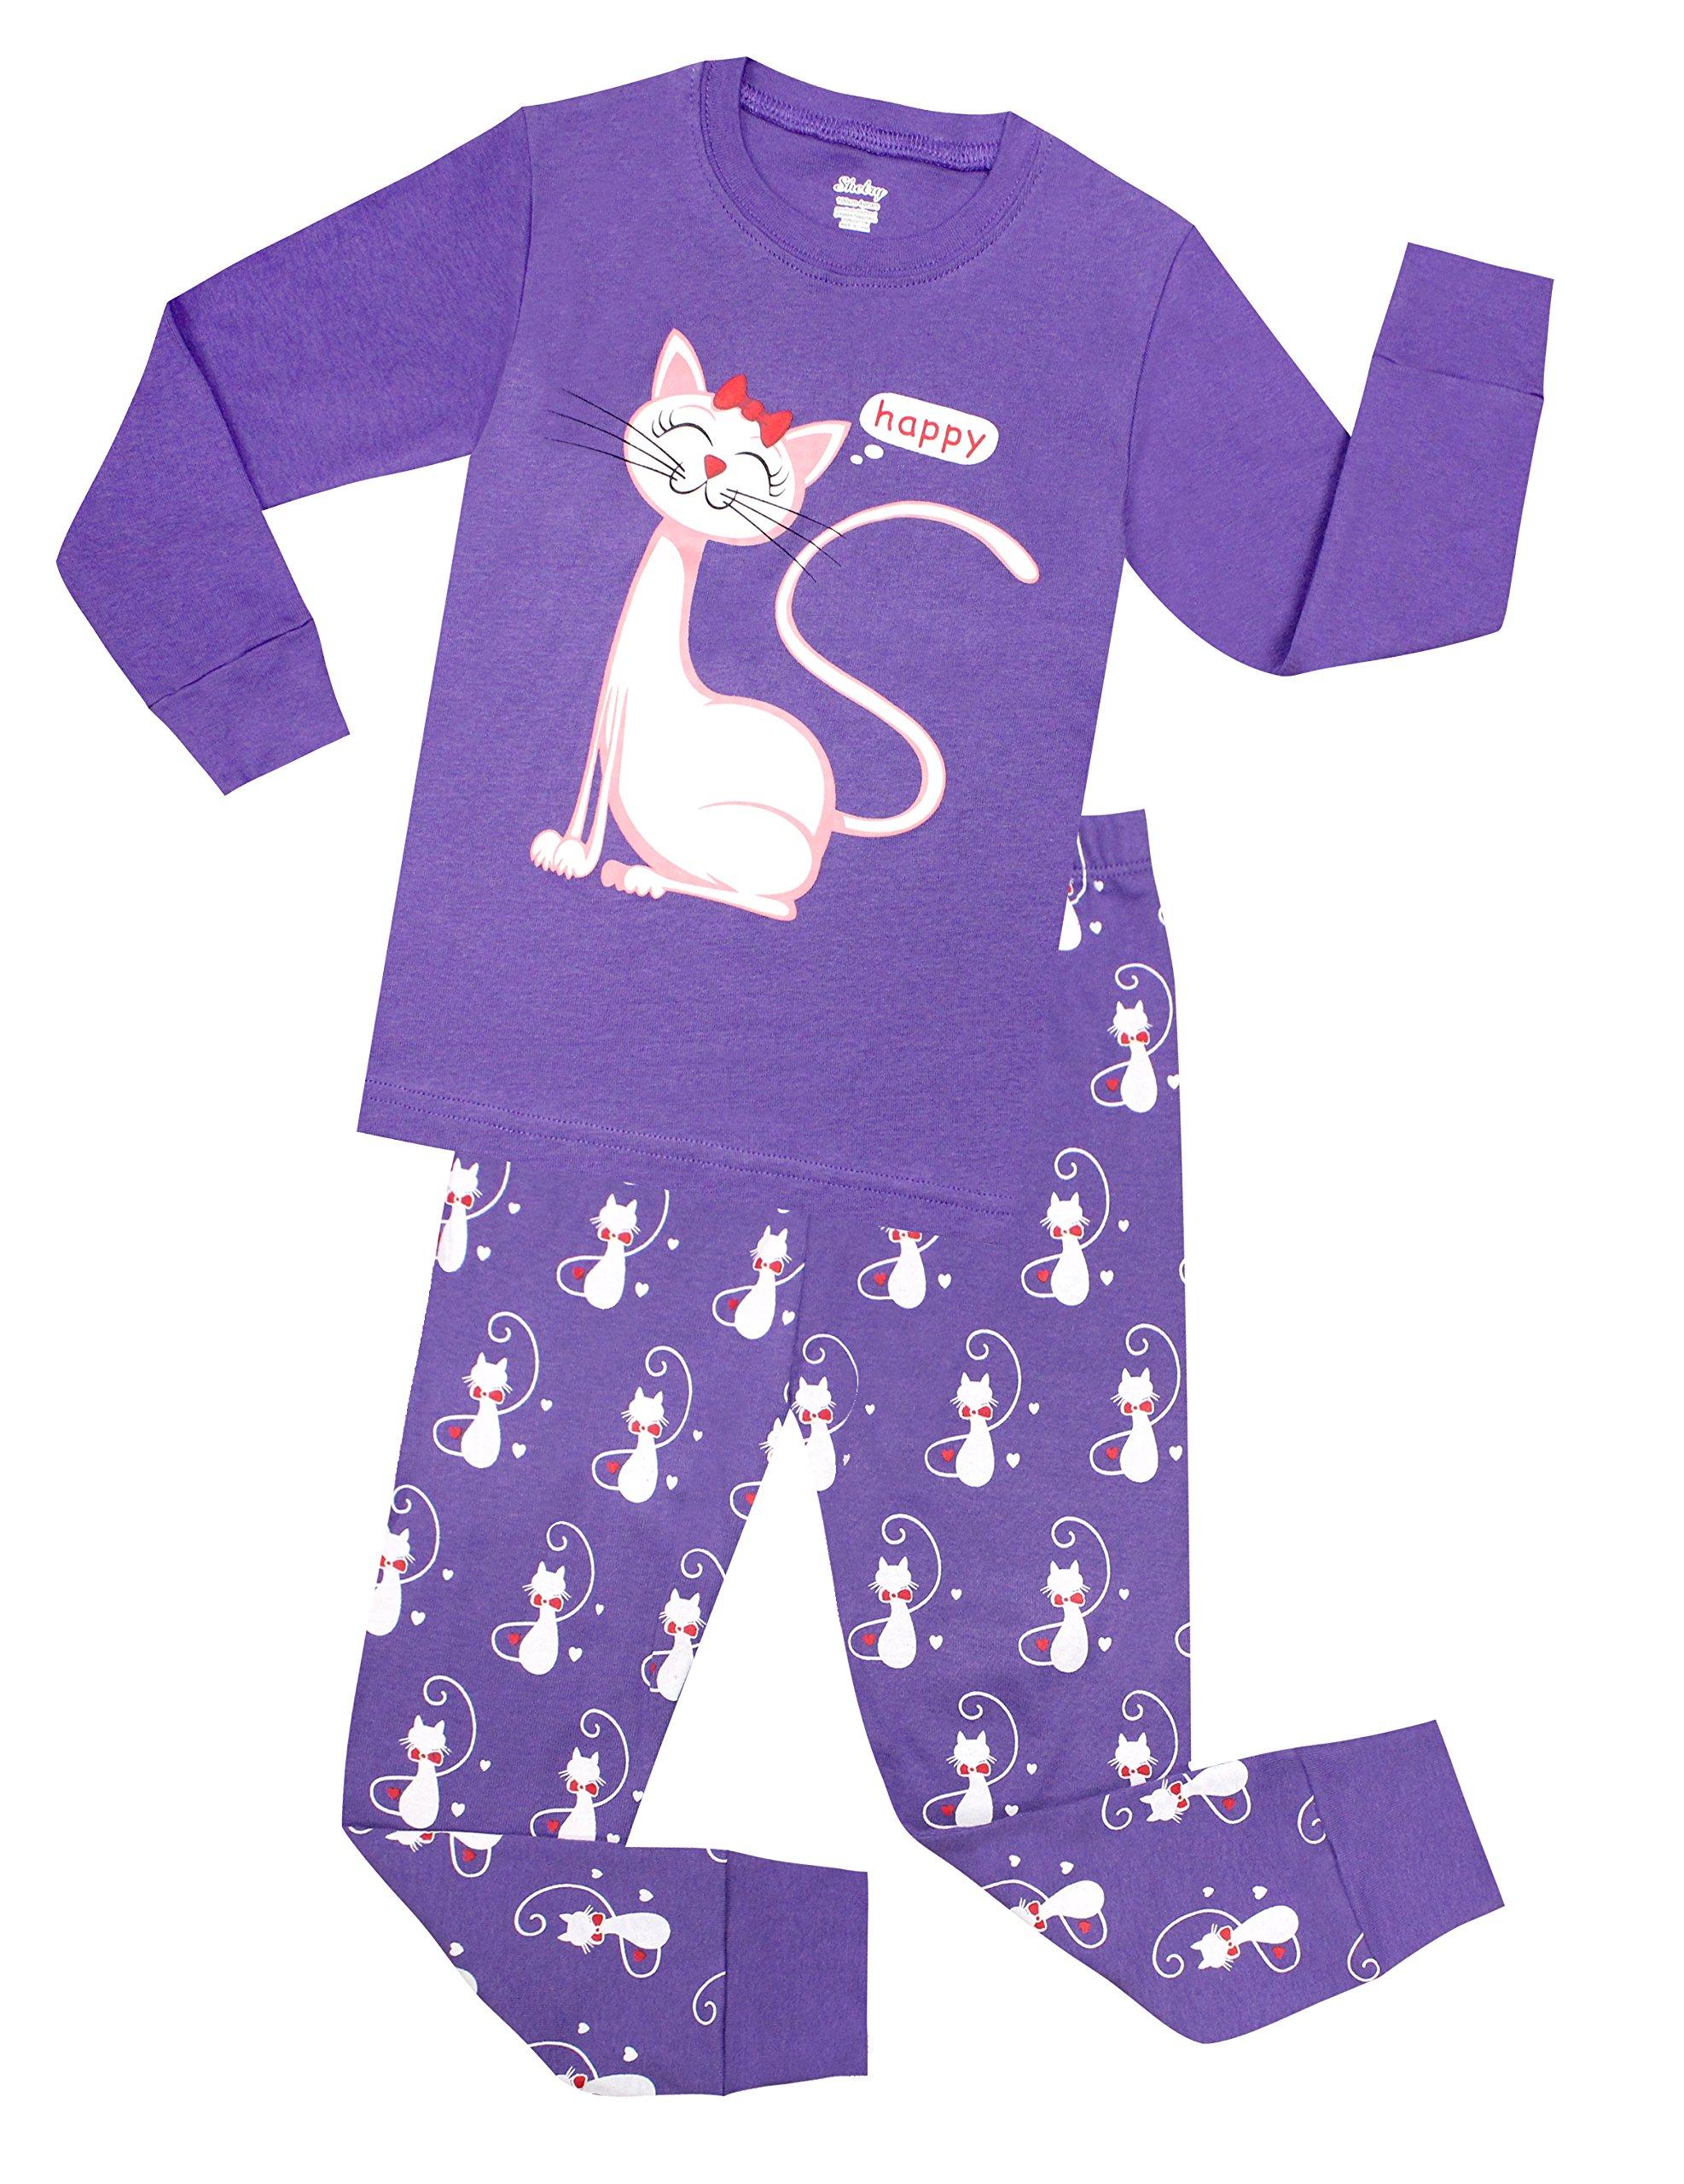 Little Girls Cat Pajamas Toddler Sleepwear Children Cotton Christmas PJs Set Size 12 Years